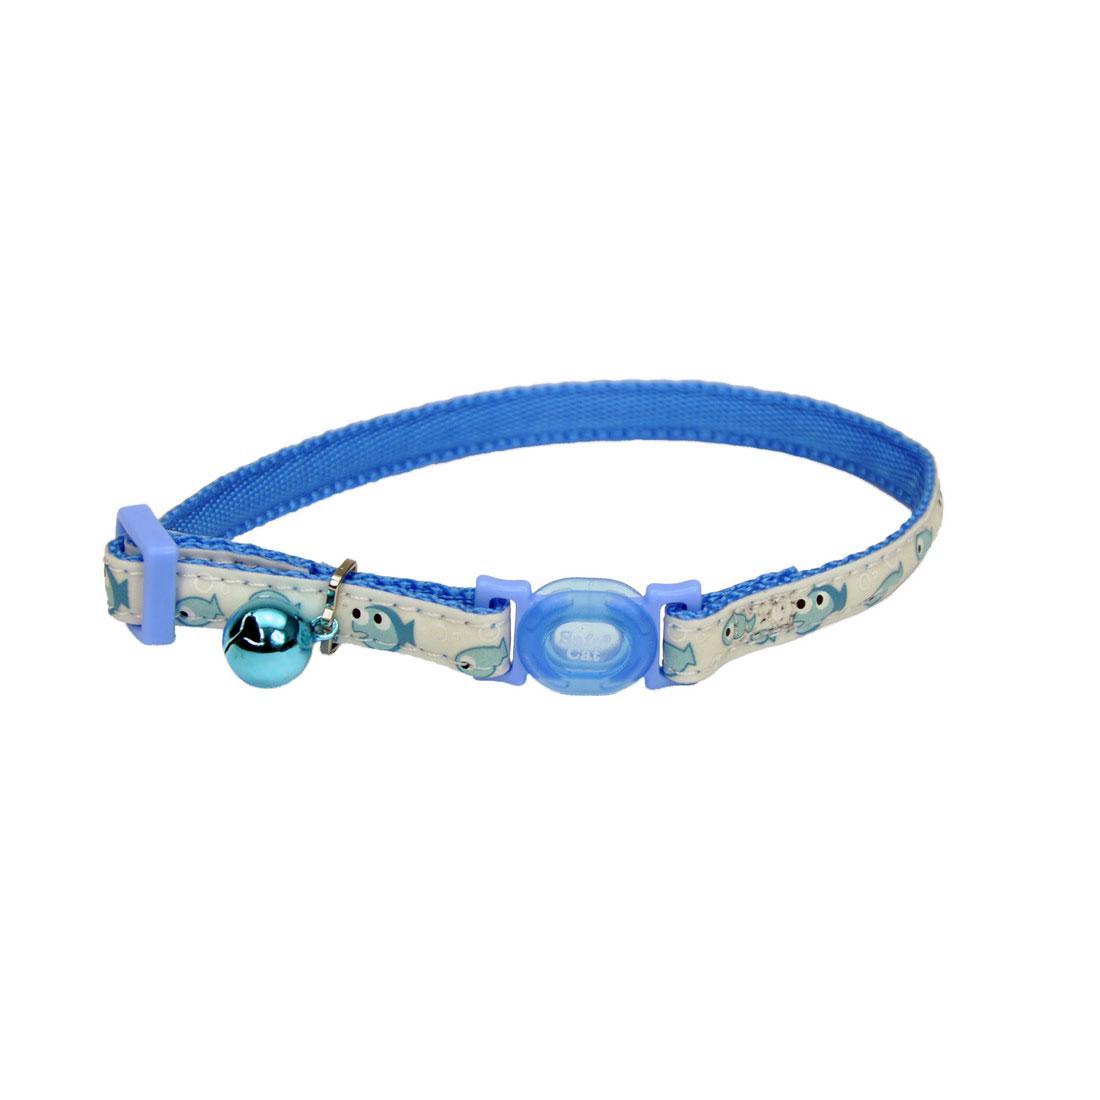 Safe Cat Glow in the Dark Adjustable Breakaway Collar, Glowing Blue Fish, 3/8-in x 8-12-in